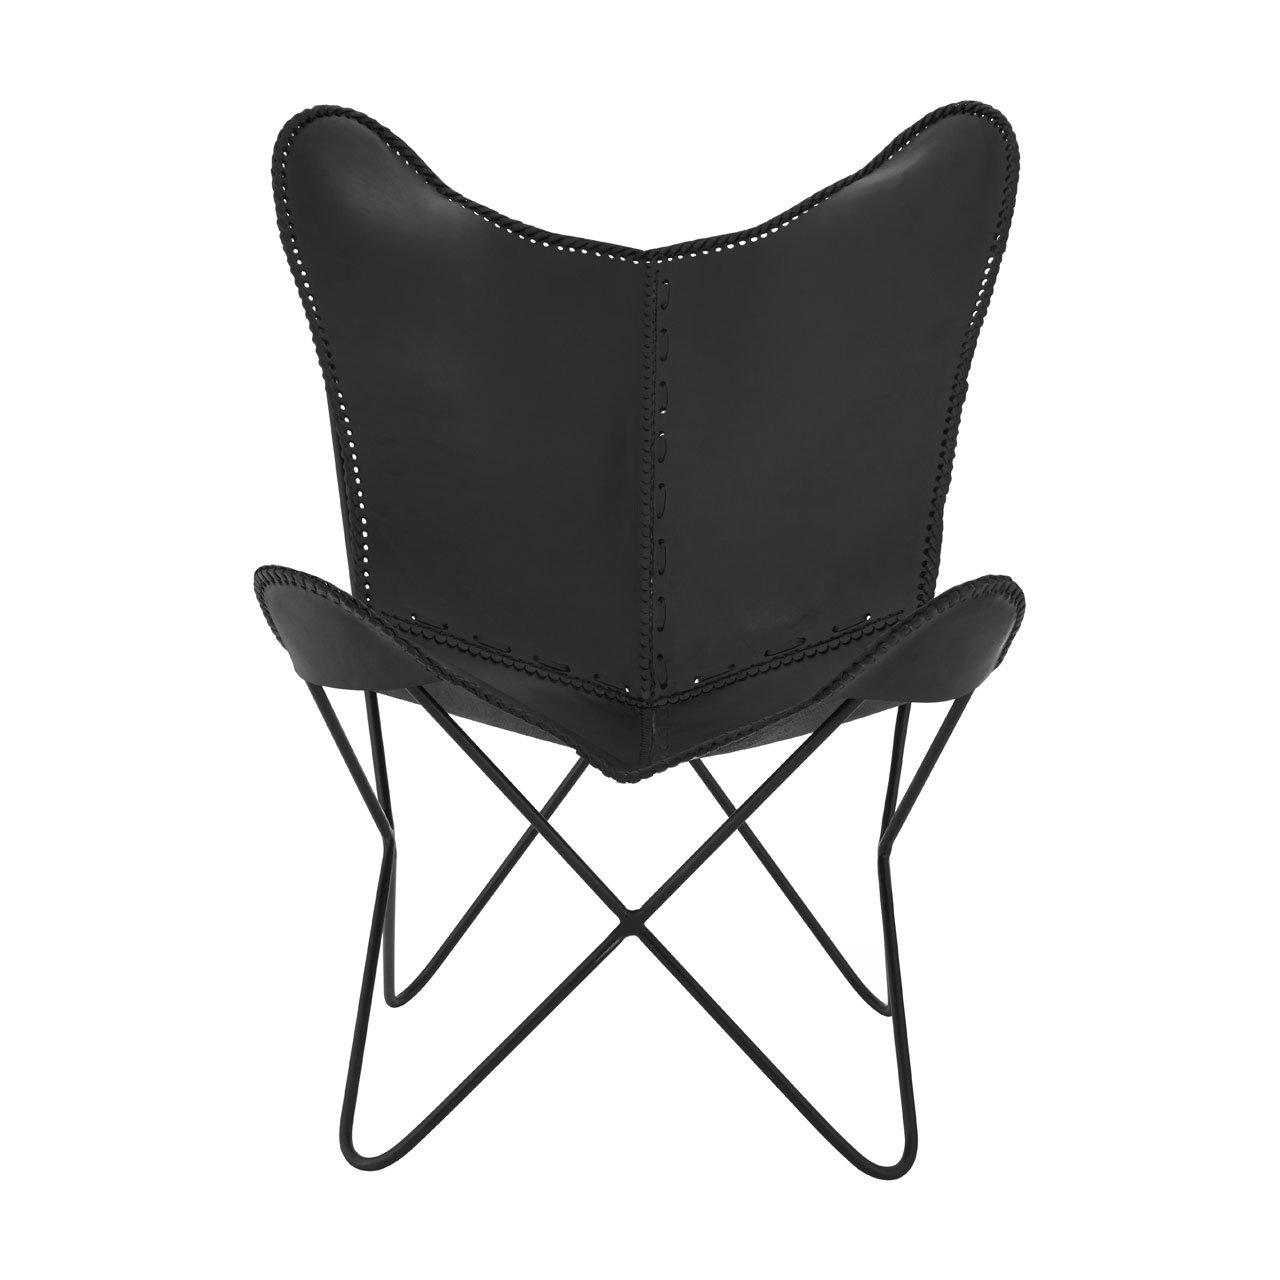 Addie Lounge Chair